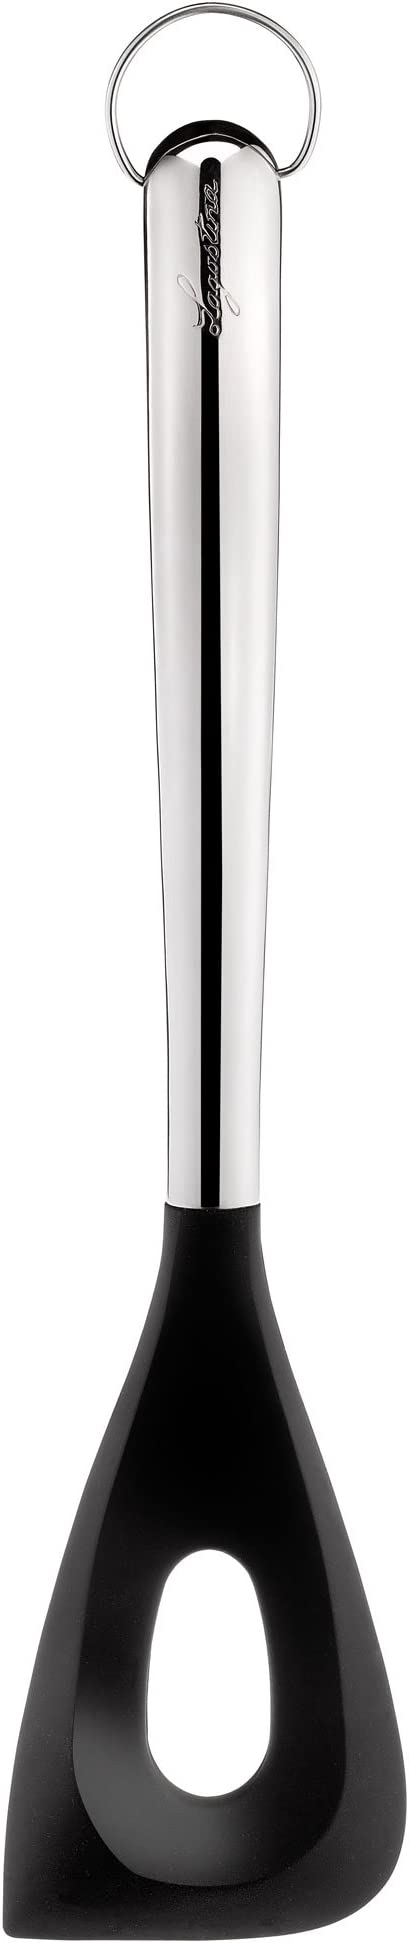 INOX 18//10 30 cm Noir Lagostina 11151620101 Cuillere A Risotto Argent